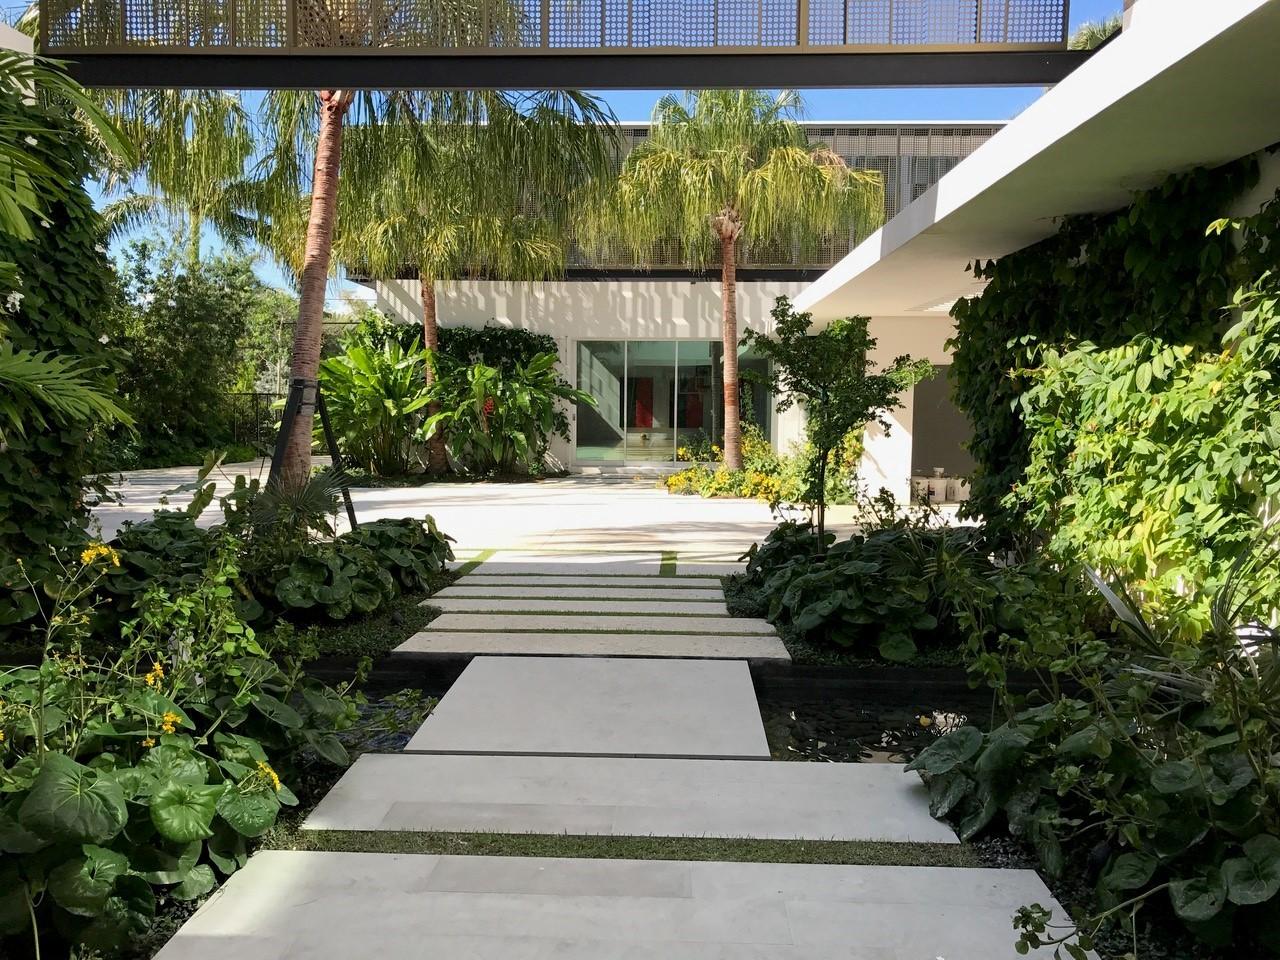 Landscape Architecture For Saota Homes Saota